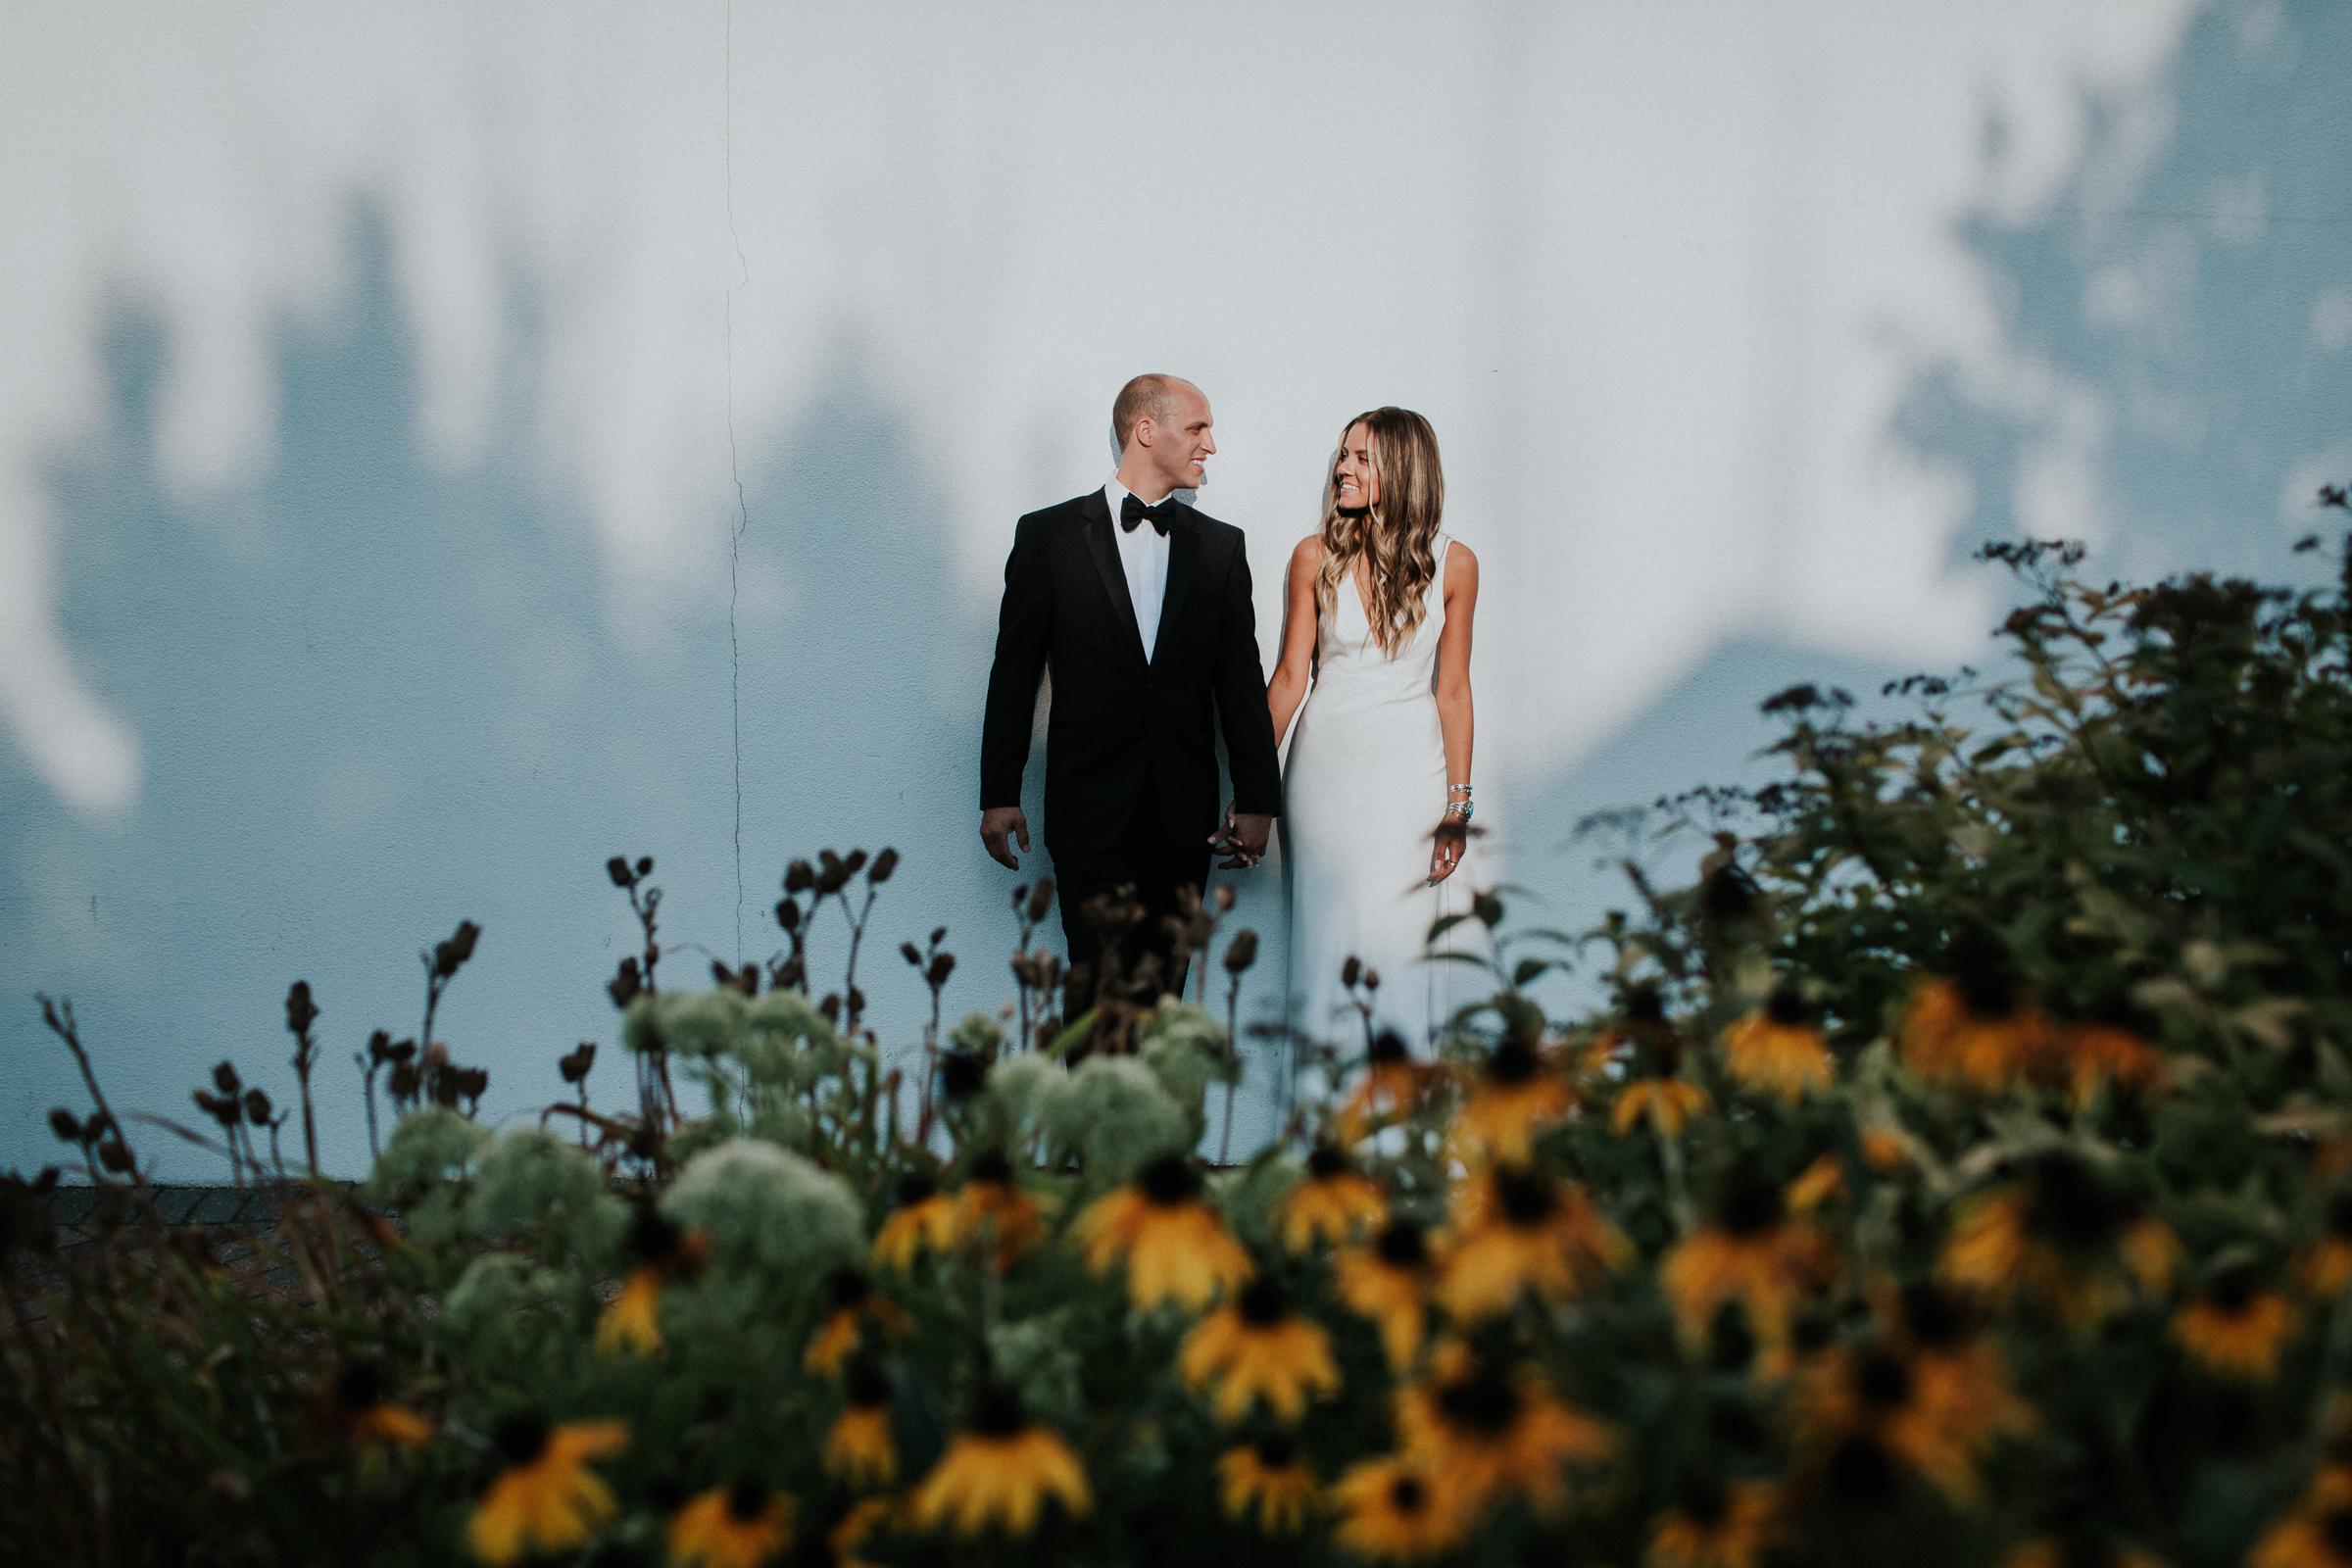 New-York-Documentary-Wedding-Photography-Best-Of-2017-by-Elvira-Kalviste-Photography-23.jpg